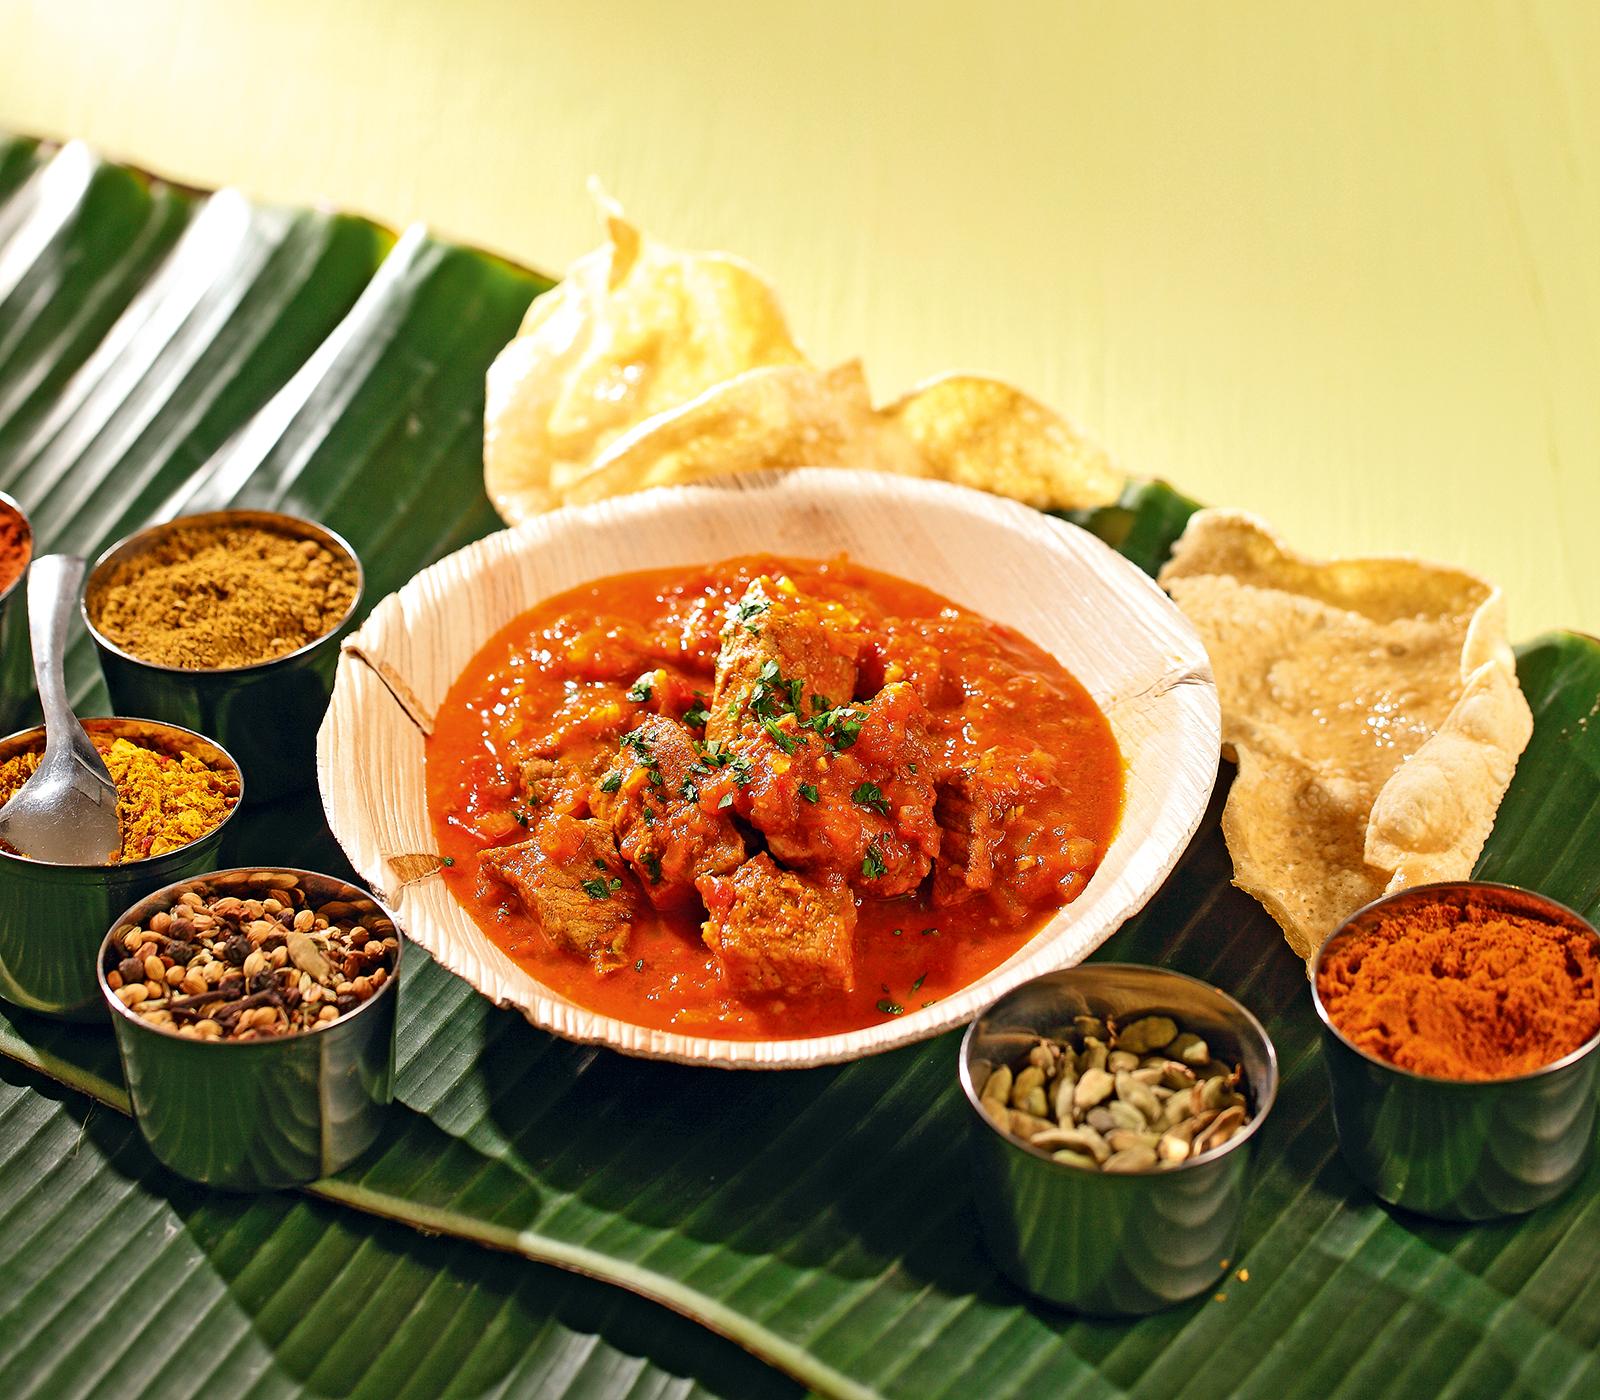 Vindaloo curry annemarie wildeisens kochen for Kochen 5 personen